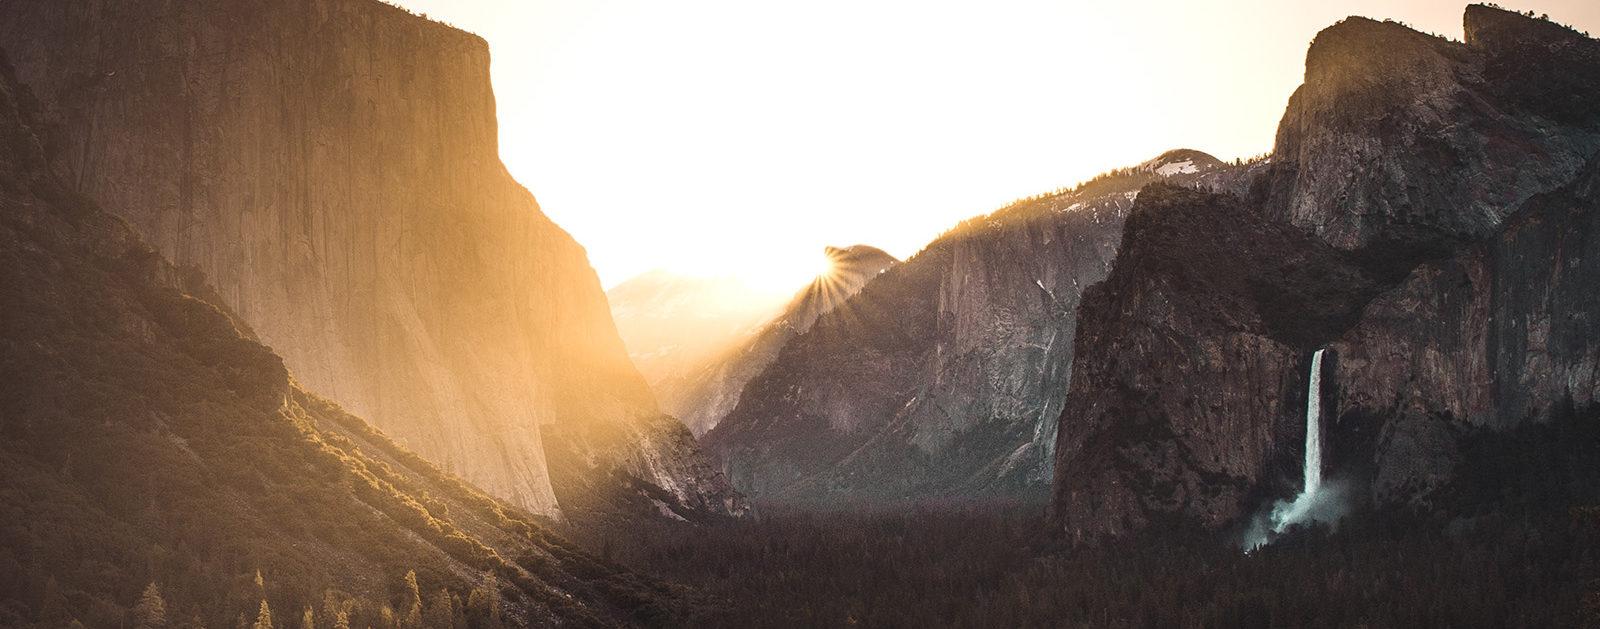 Yosemite Valley, CA | Casey Horner